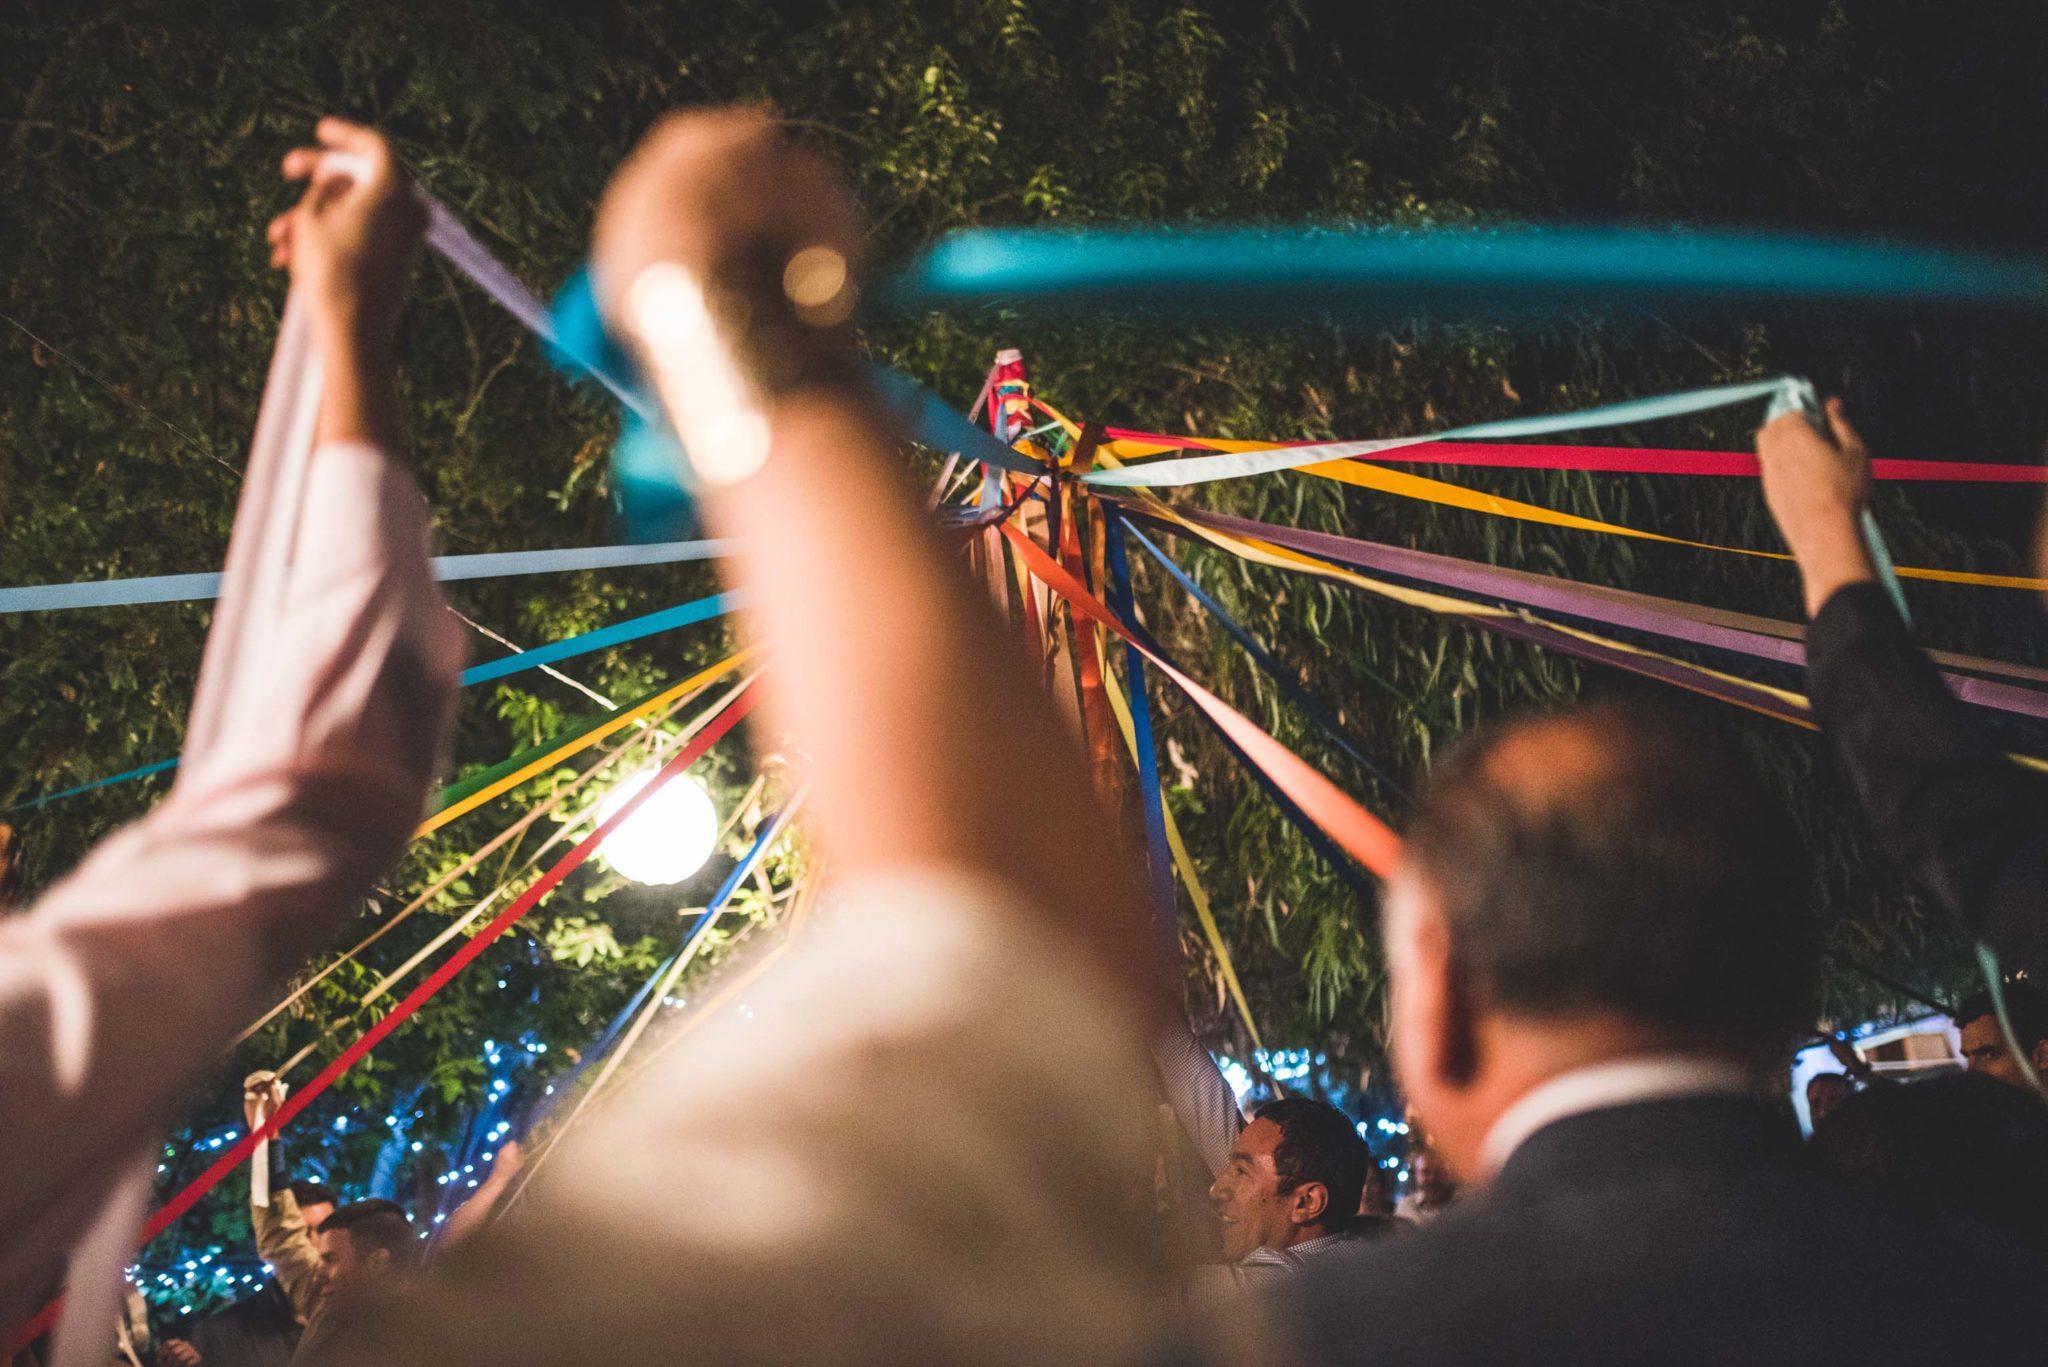 union civil-matrimonio igualitario-matrimonio gay-entre alamos y cachapoal